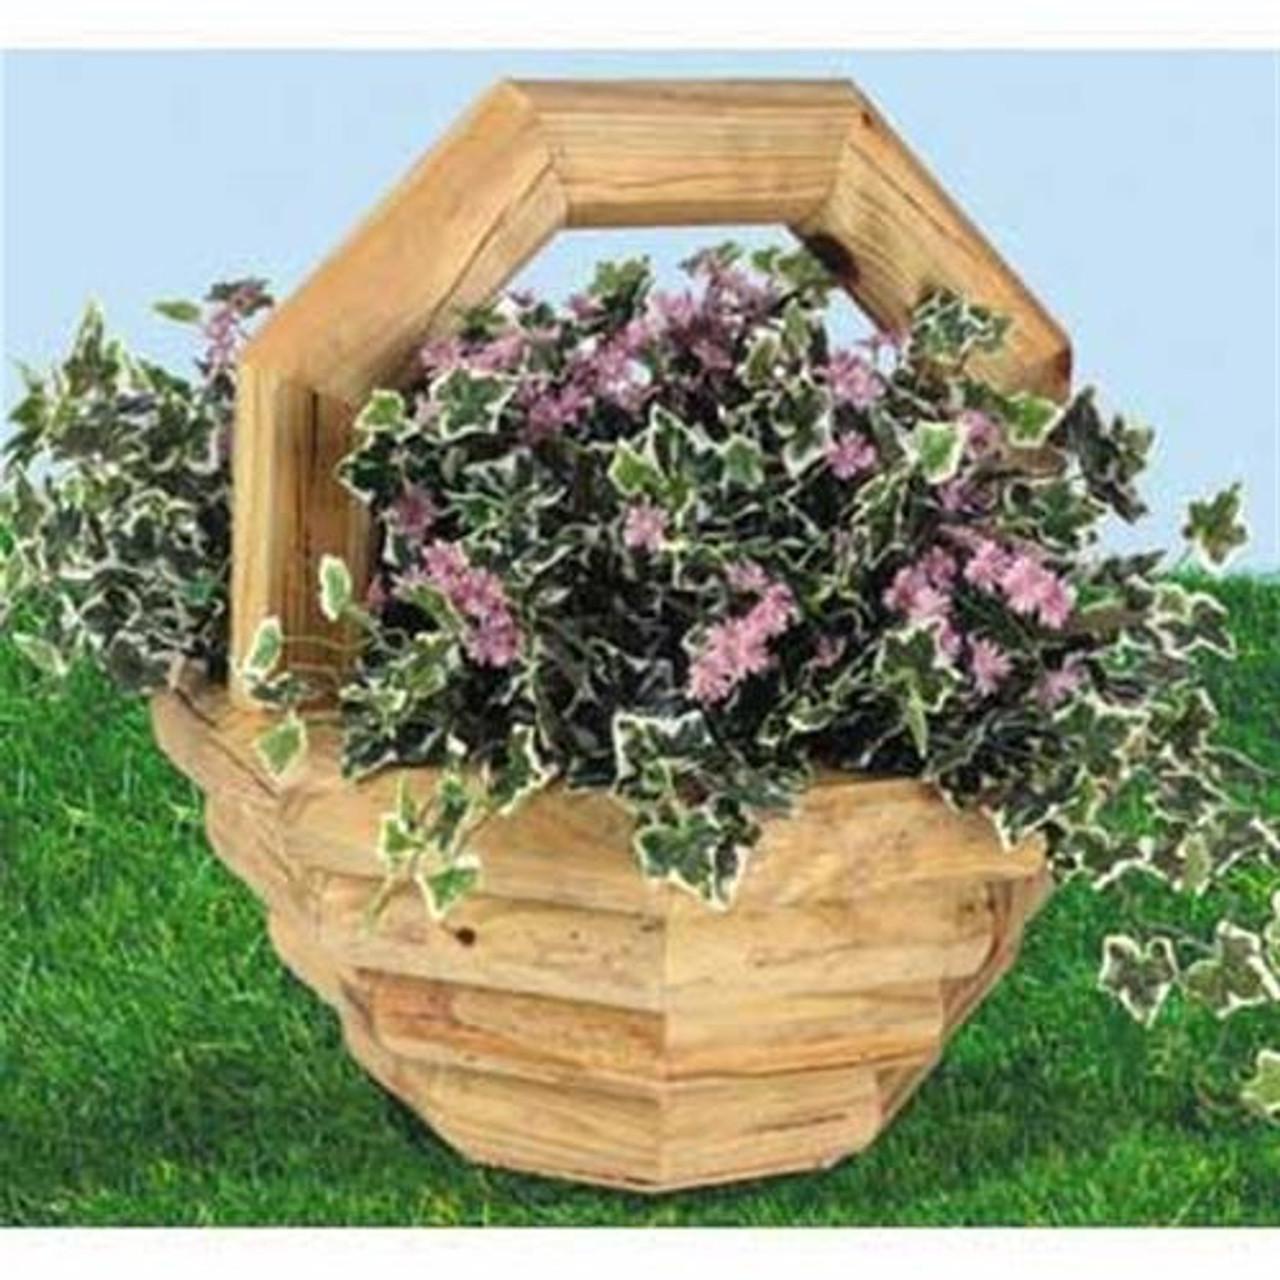 Wildwood Designs Basket Planter Woodworking Plan